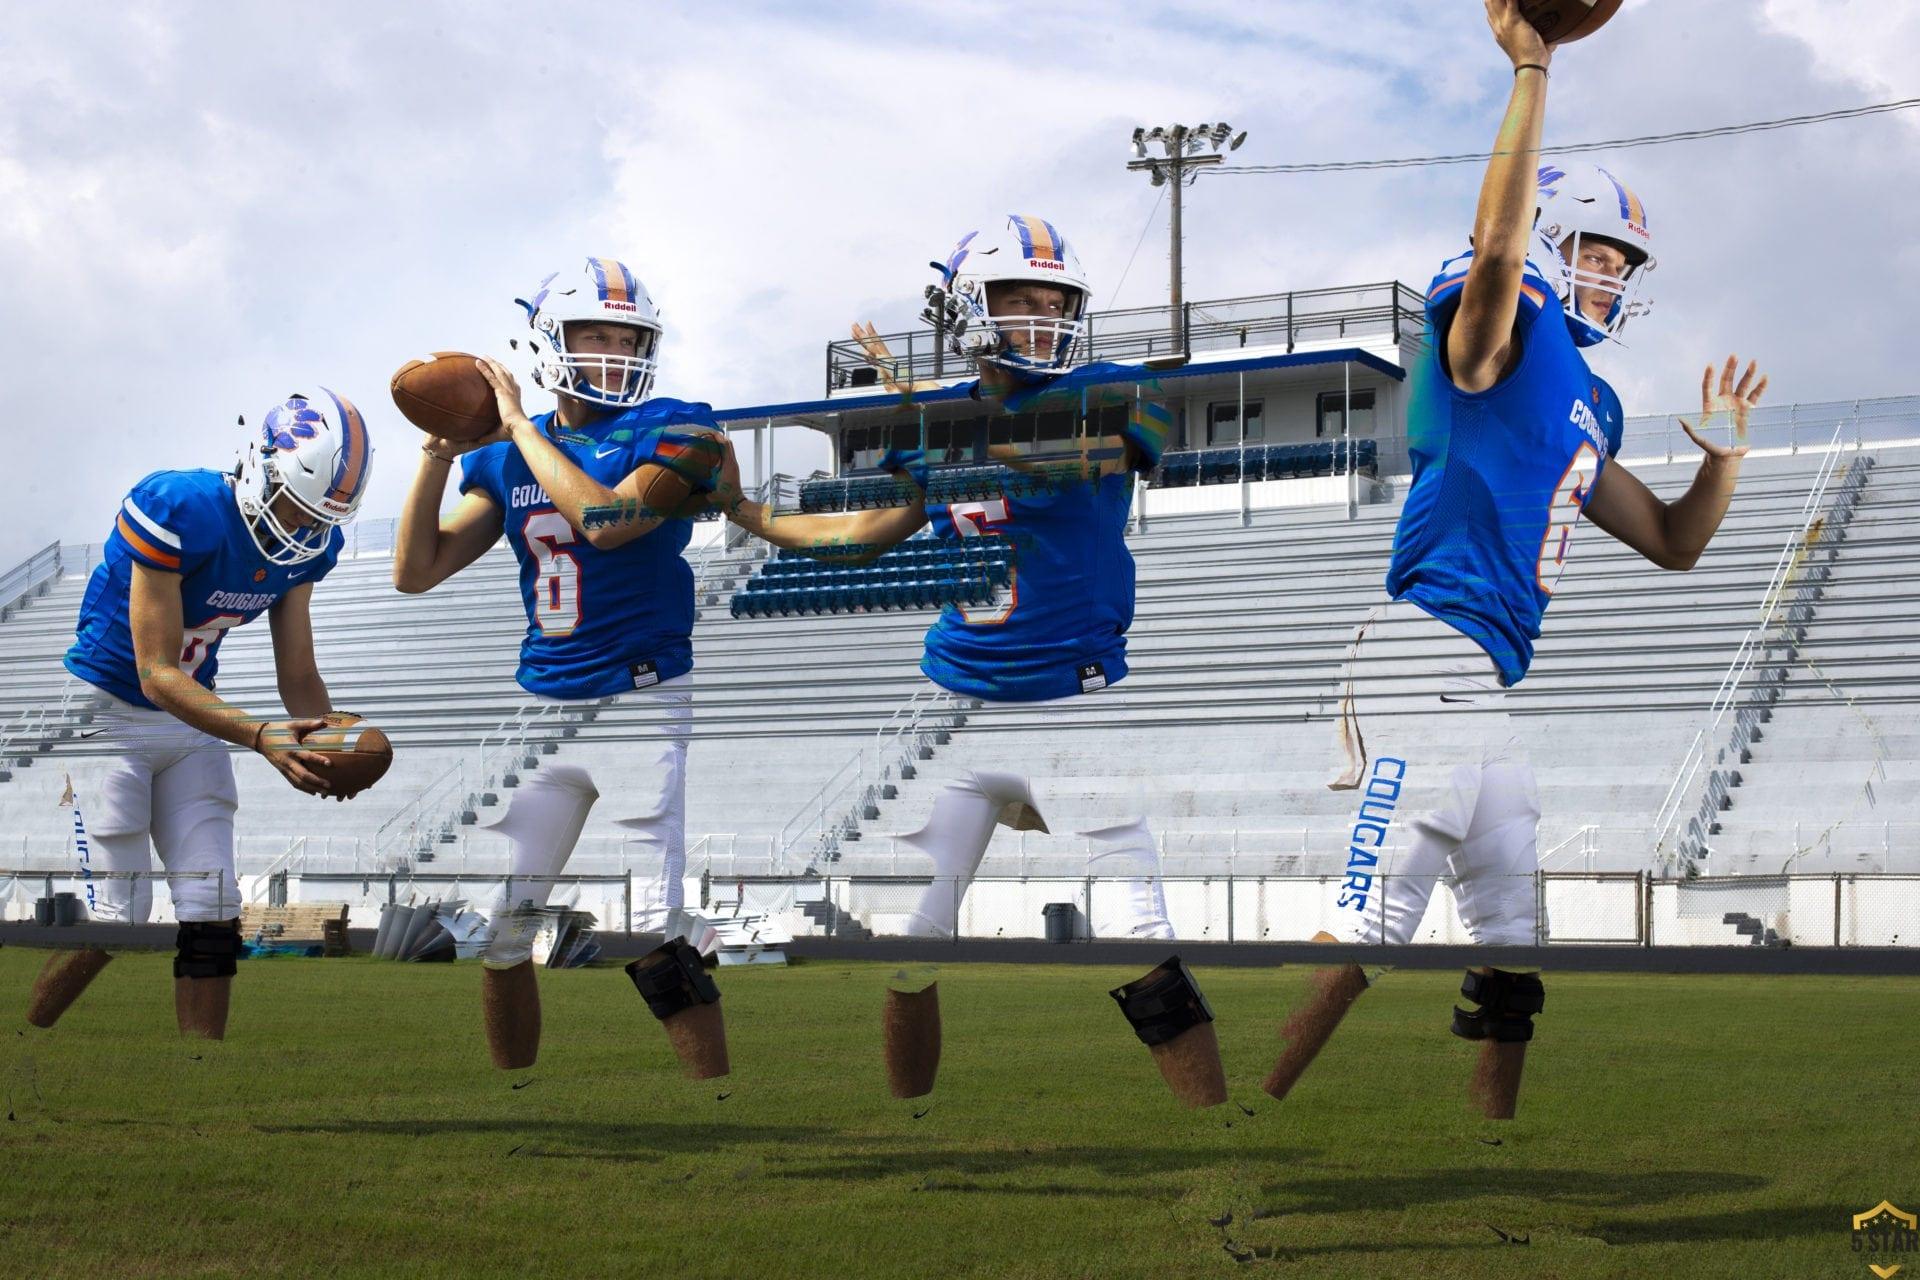 Campbell County quarterback Landon Addington (Photo by Danny Parker)